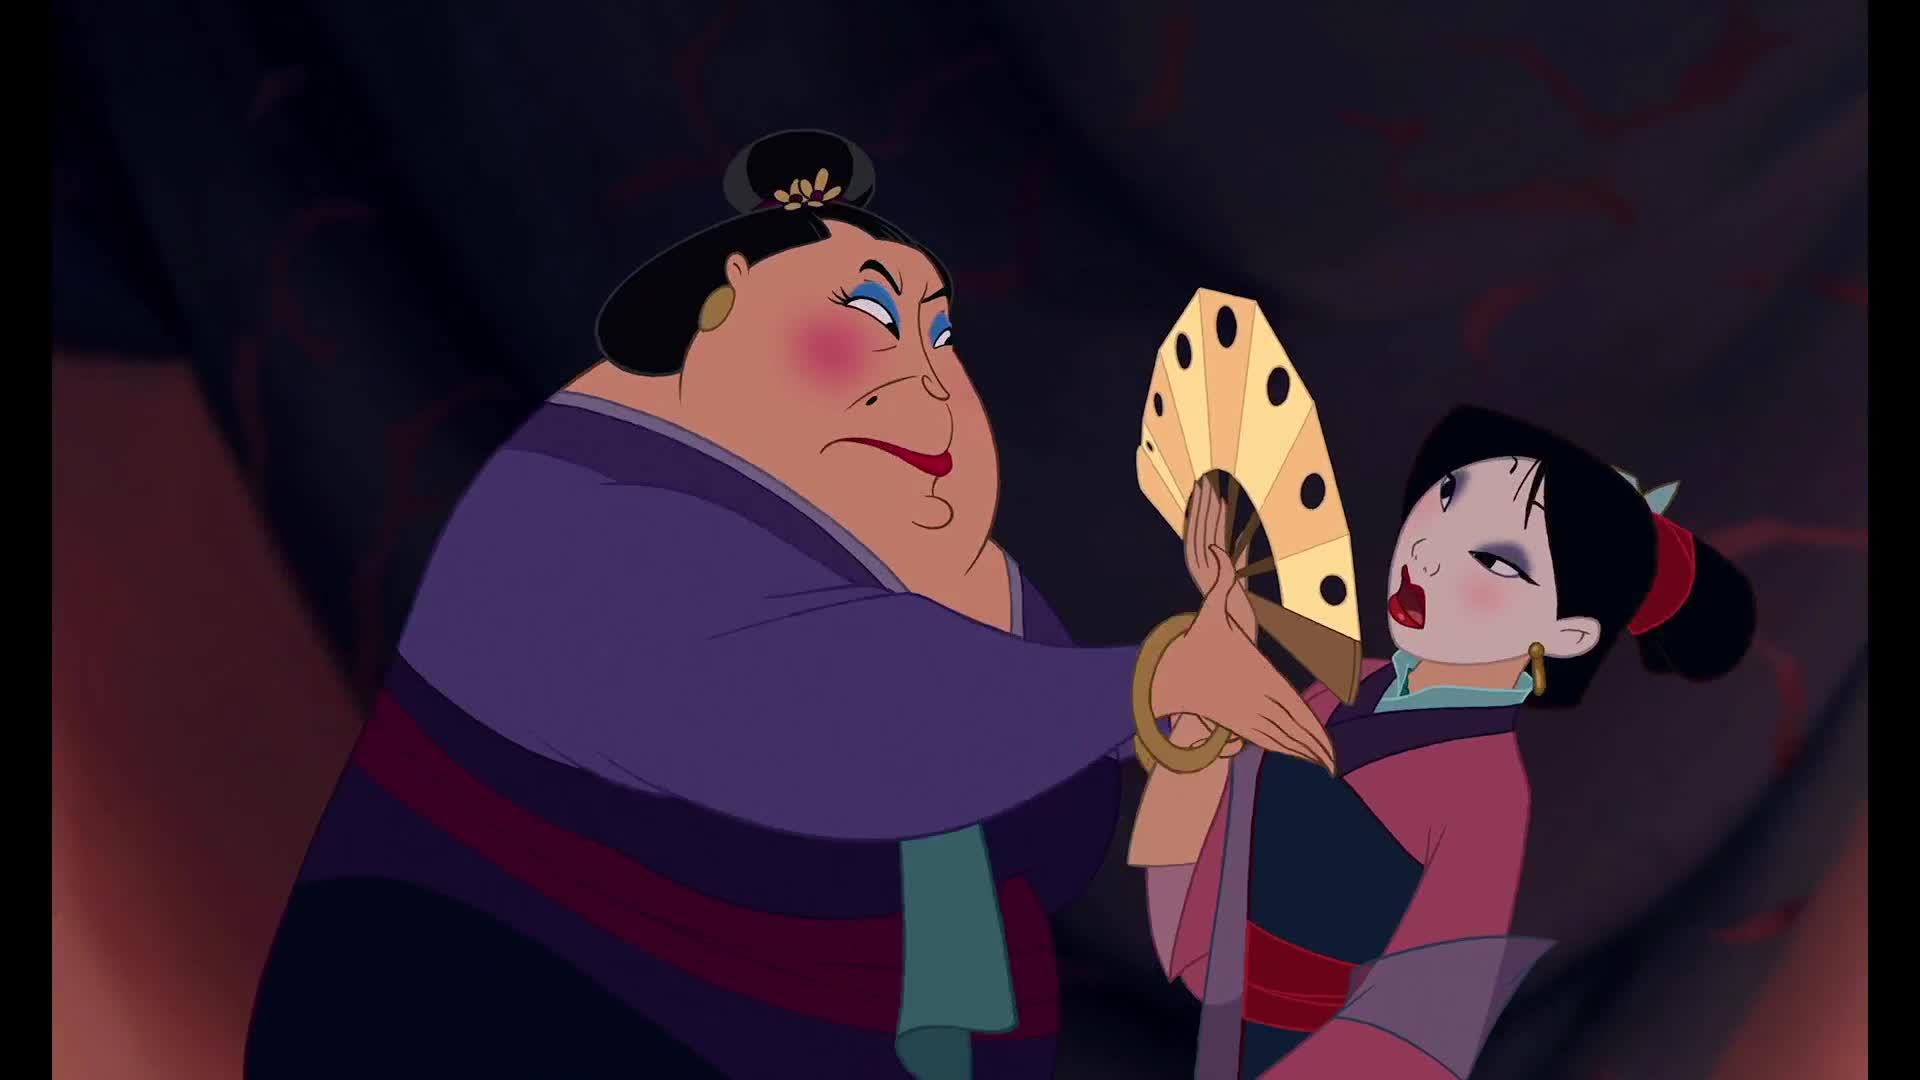 Mulan 1 มู่หลาน ภาค 1 (1998)